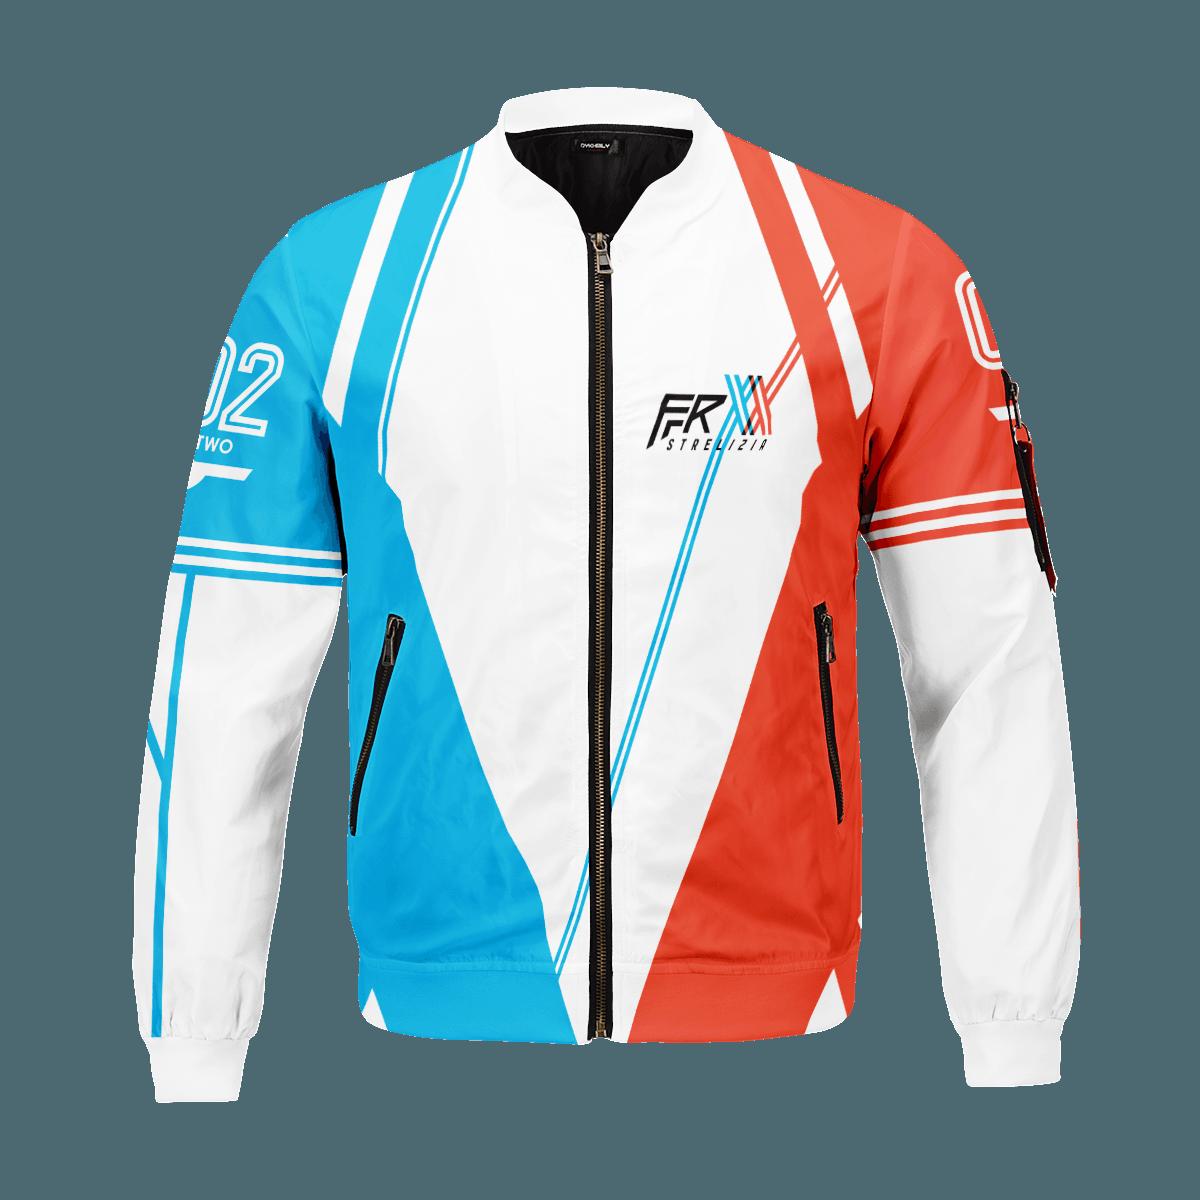 darling in the franxx strelizia bomber jacket 335648 - Anime Jacket